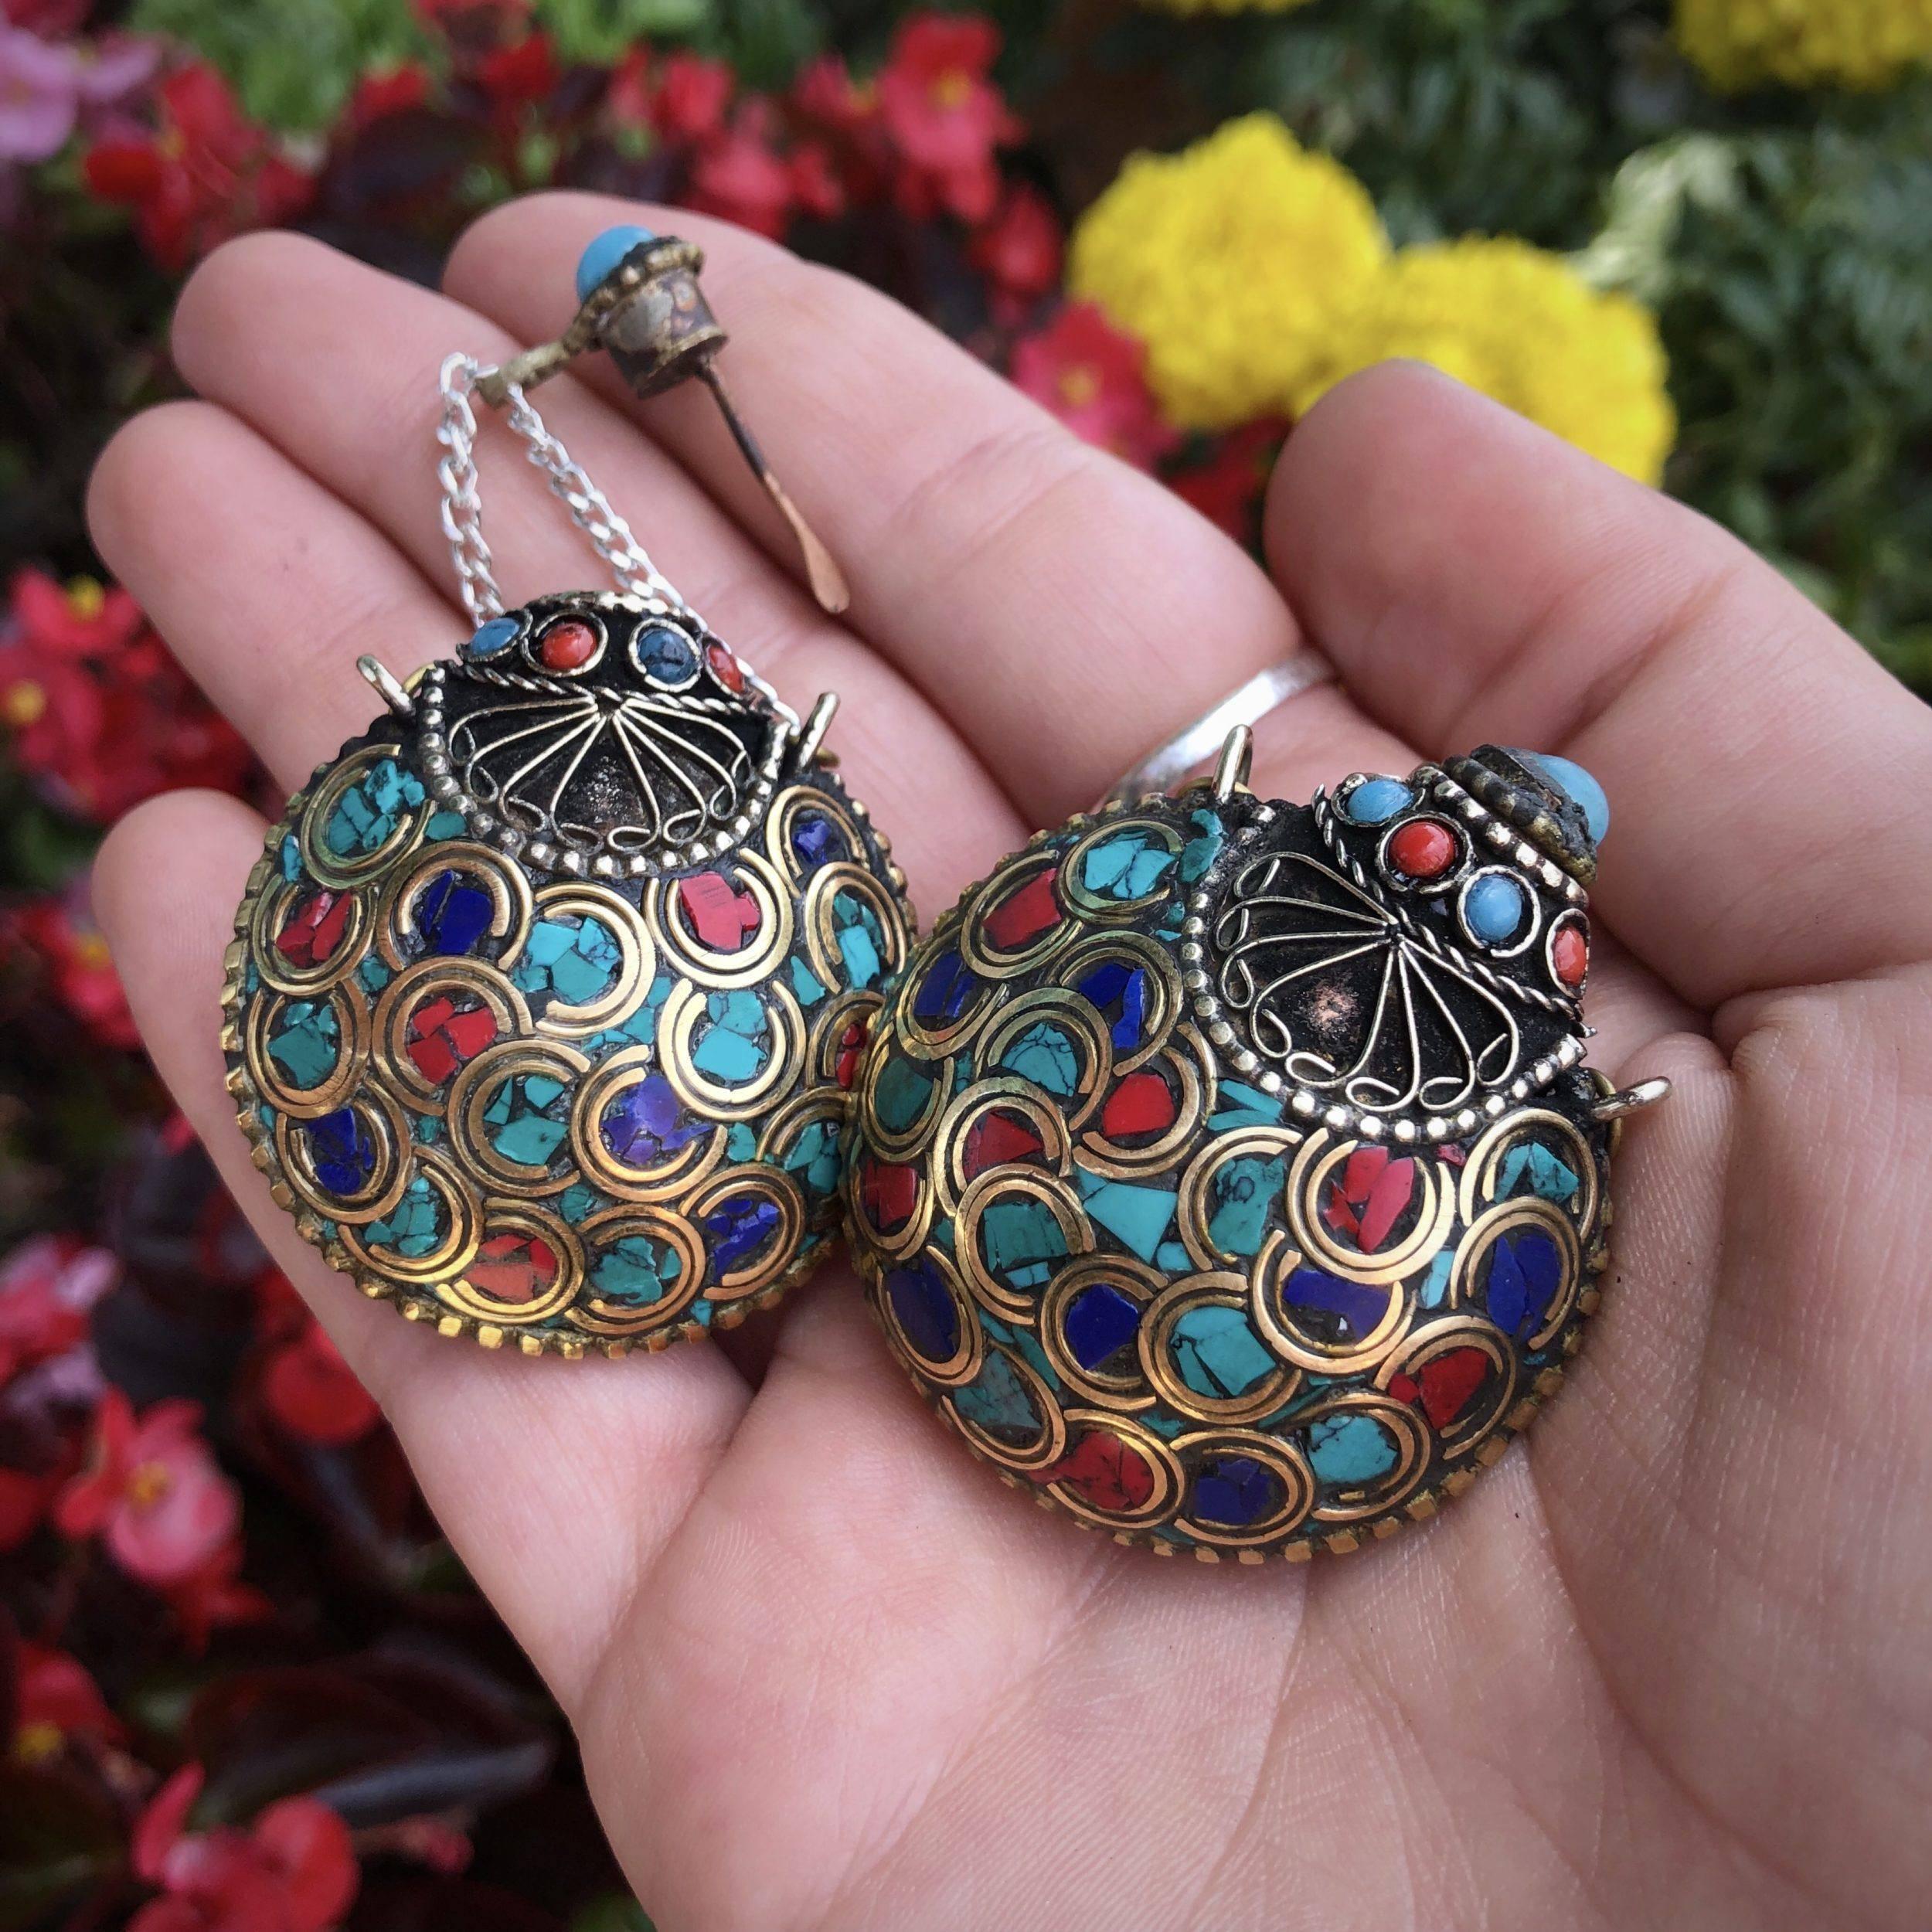 Tibetan_Amulets_1of2_7_23